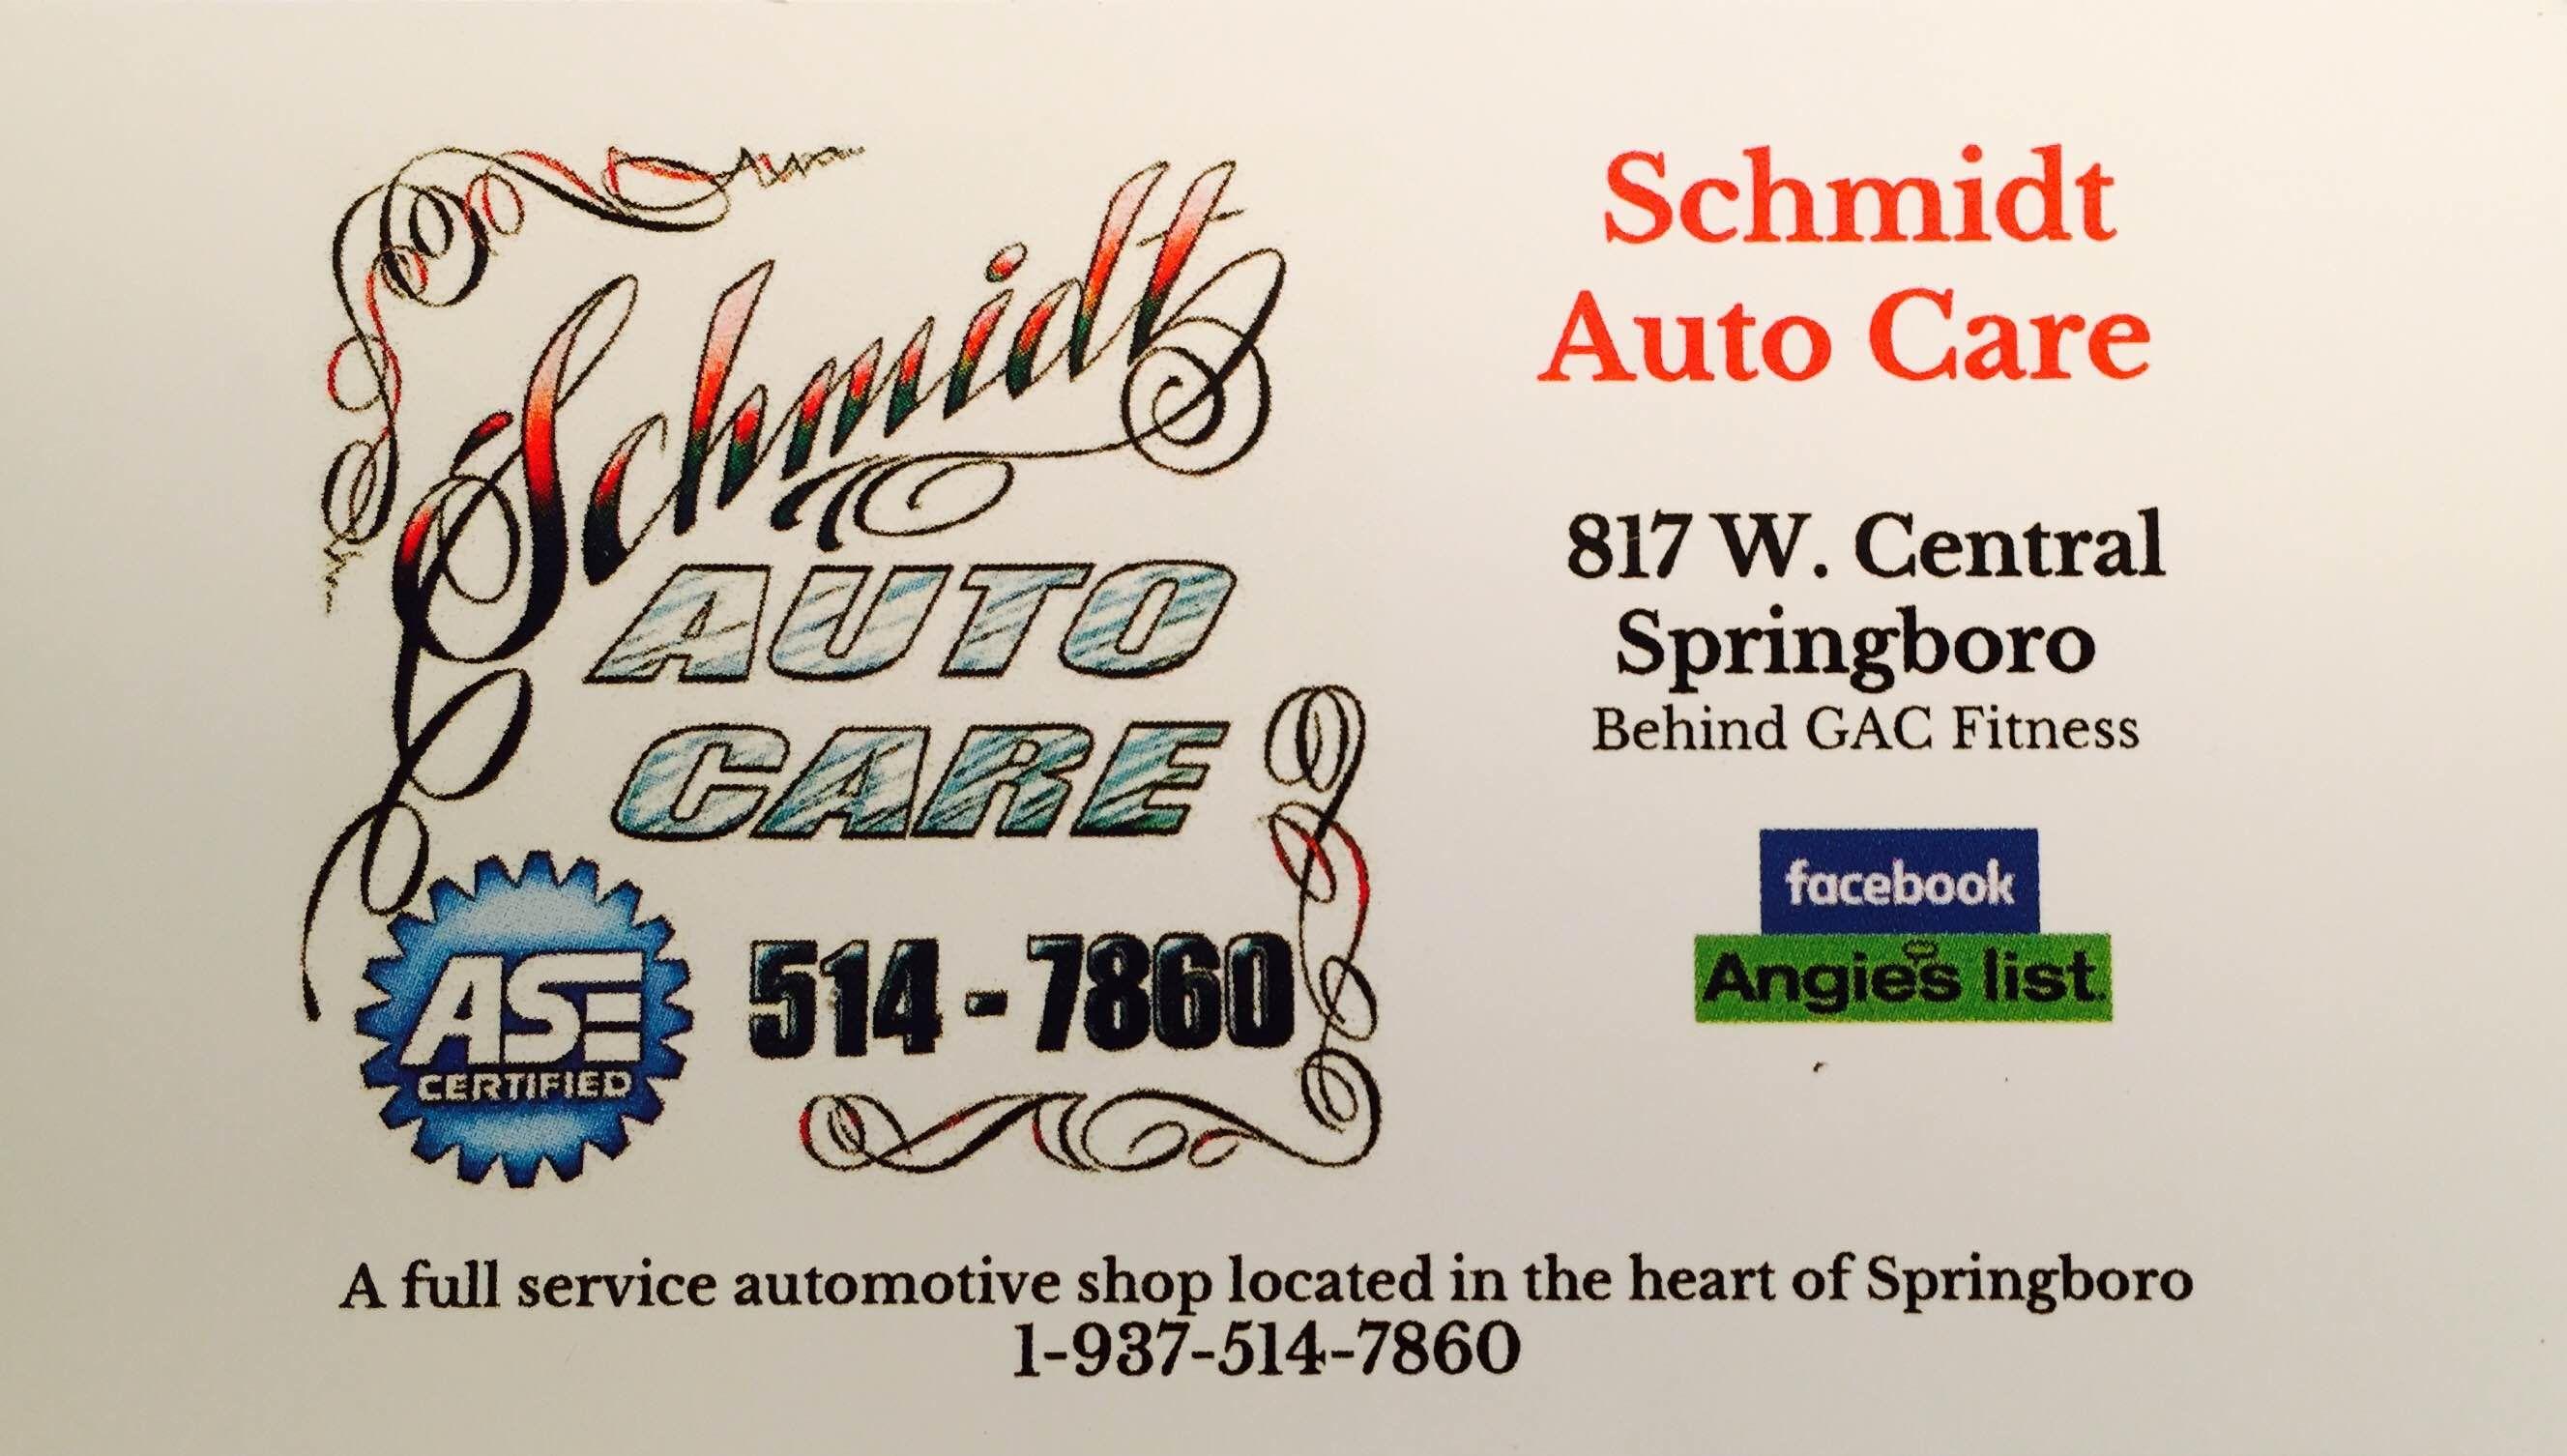 Ase Certified Car Shop Schmidt Auto Care Providing Honest And